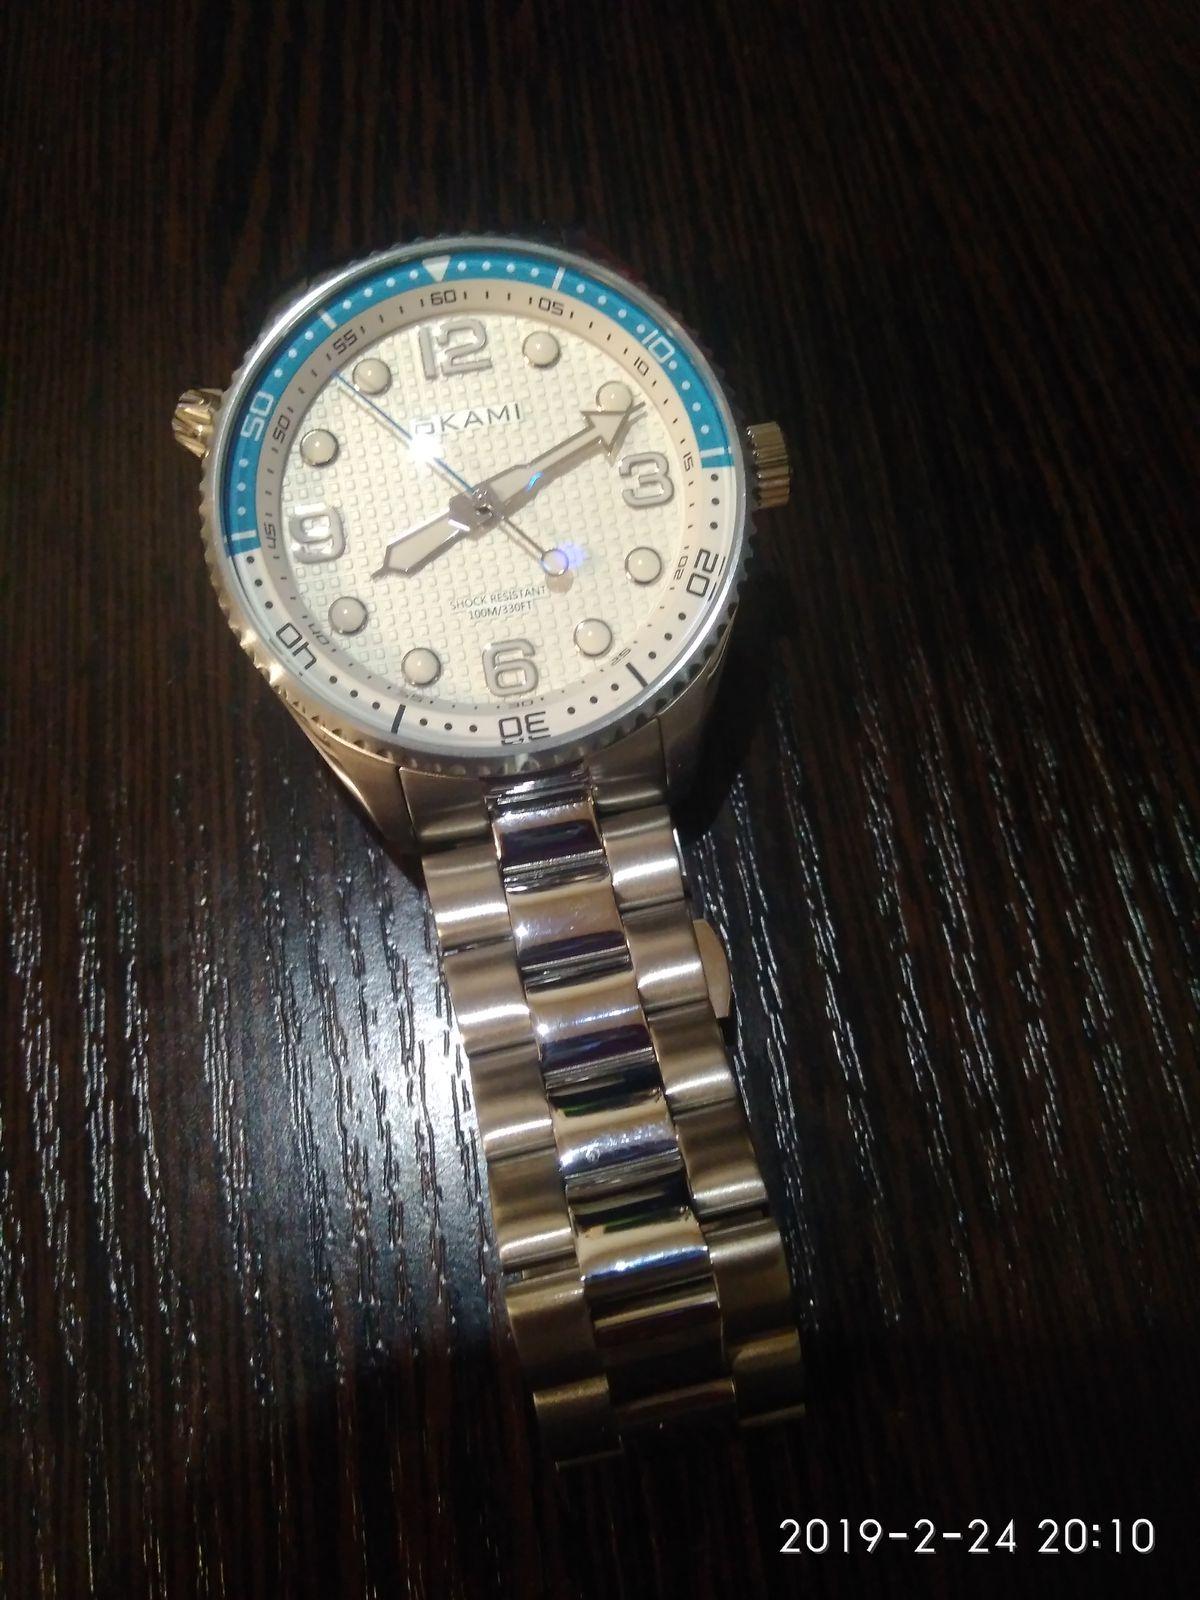 Симпатичные часы)